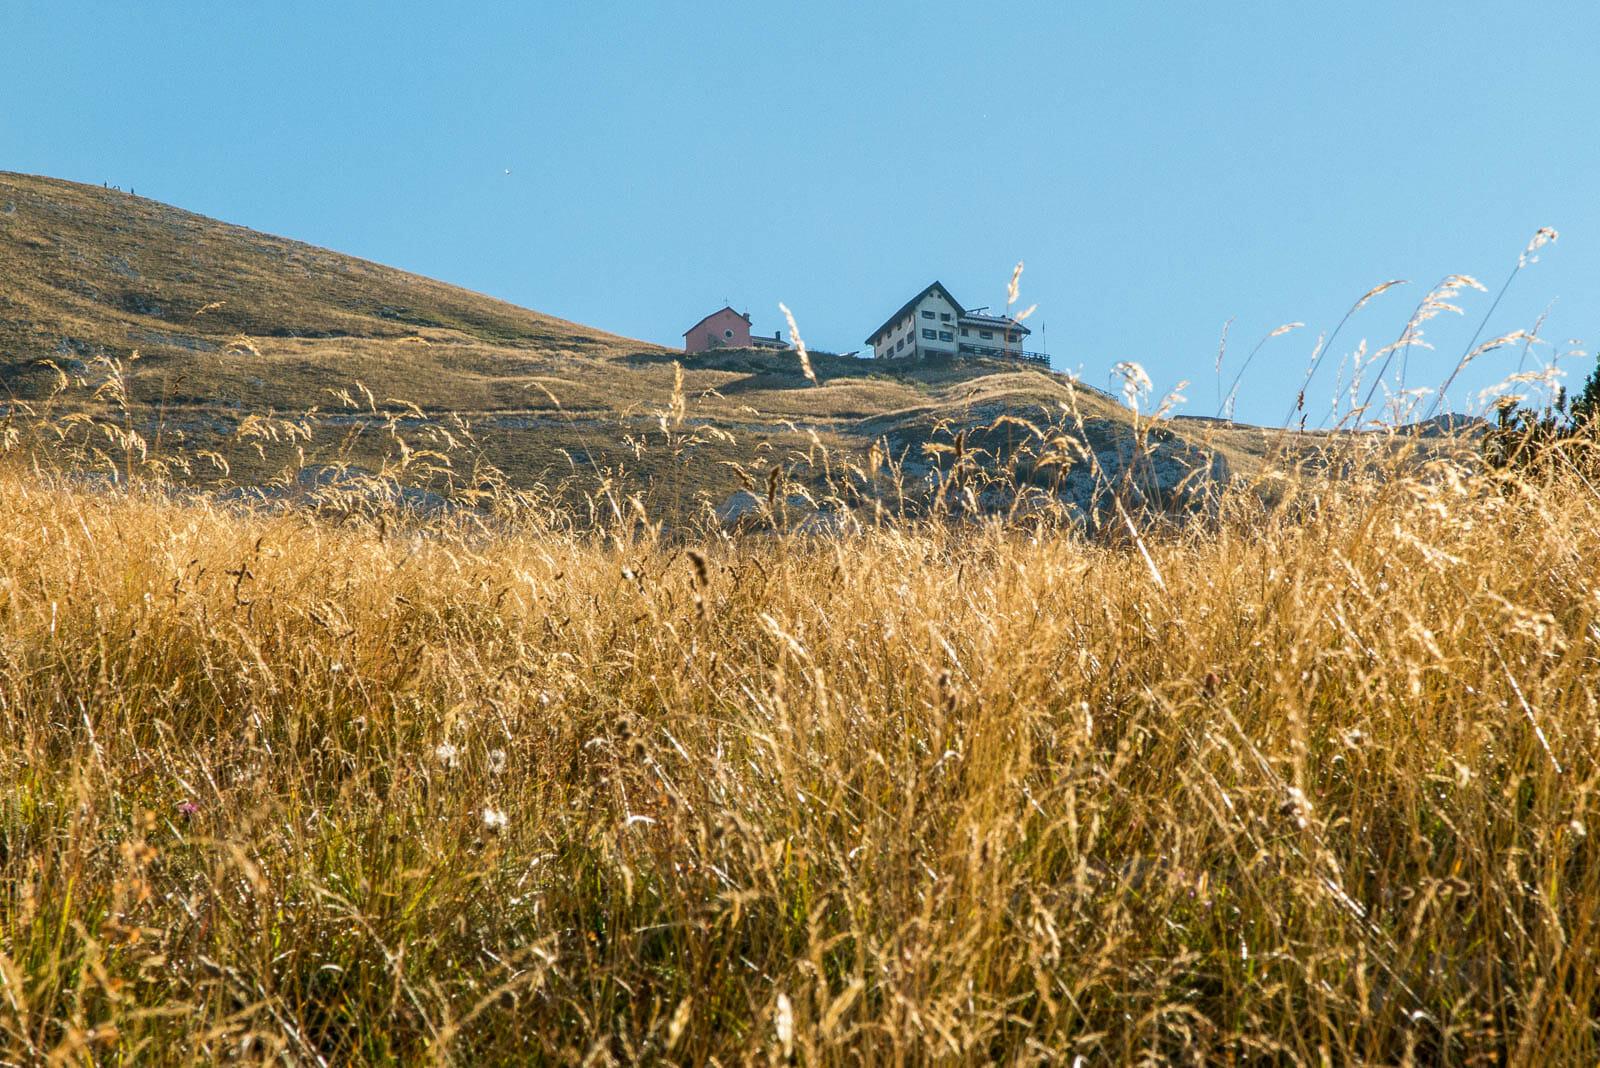 monte baldo trail 654 alm and meadows